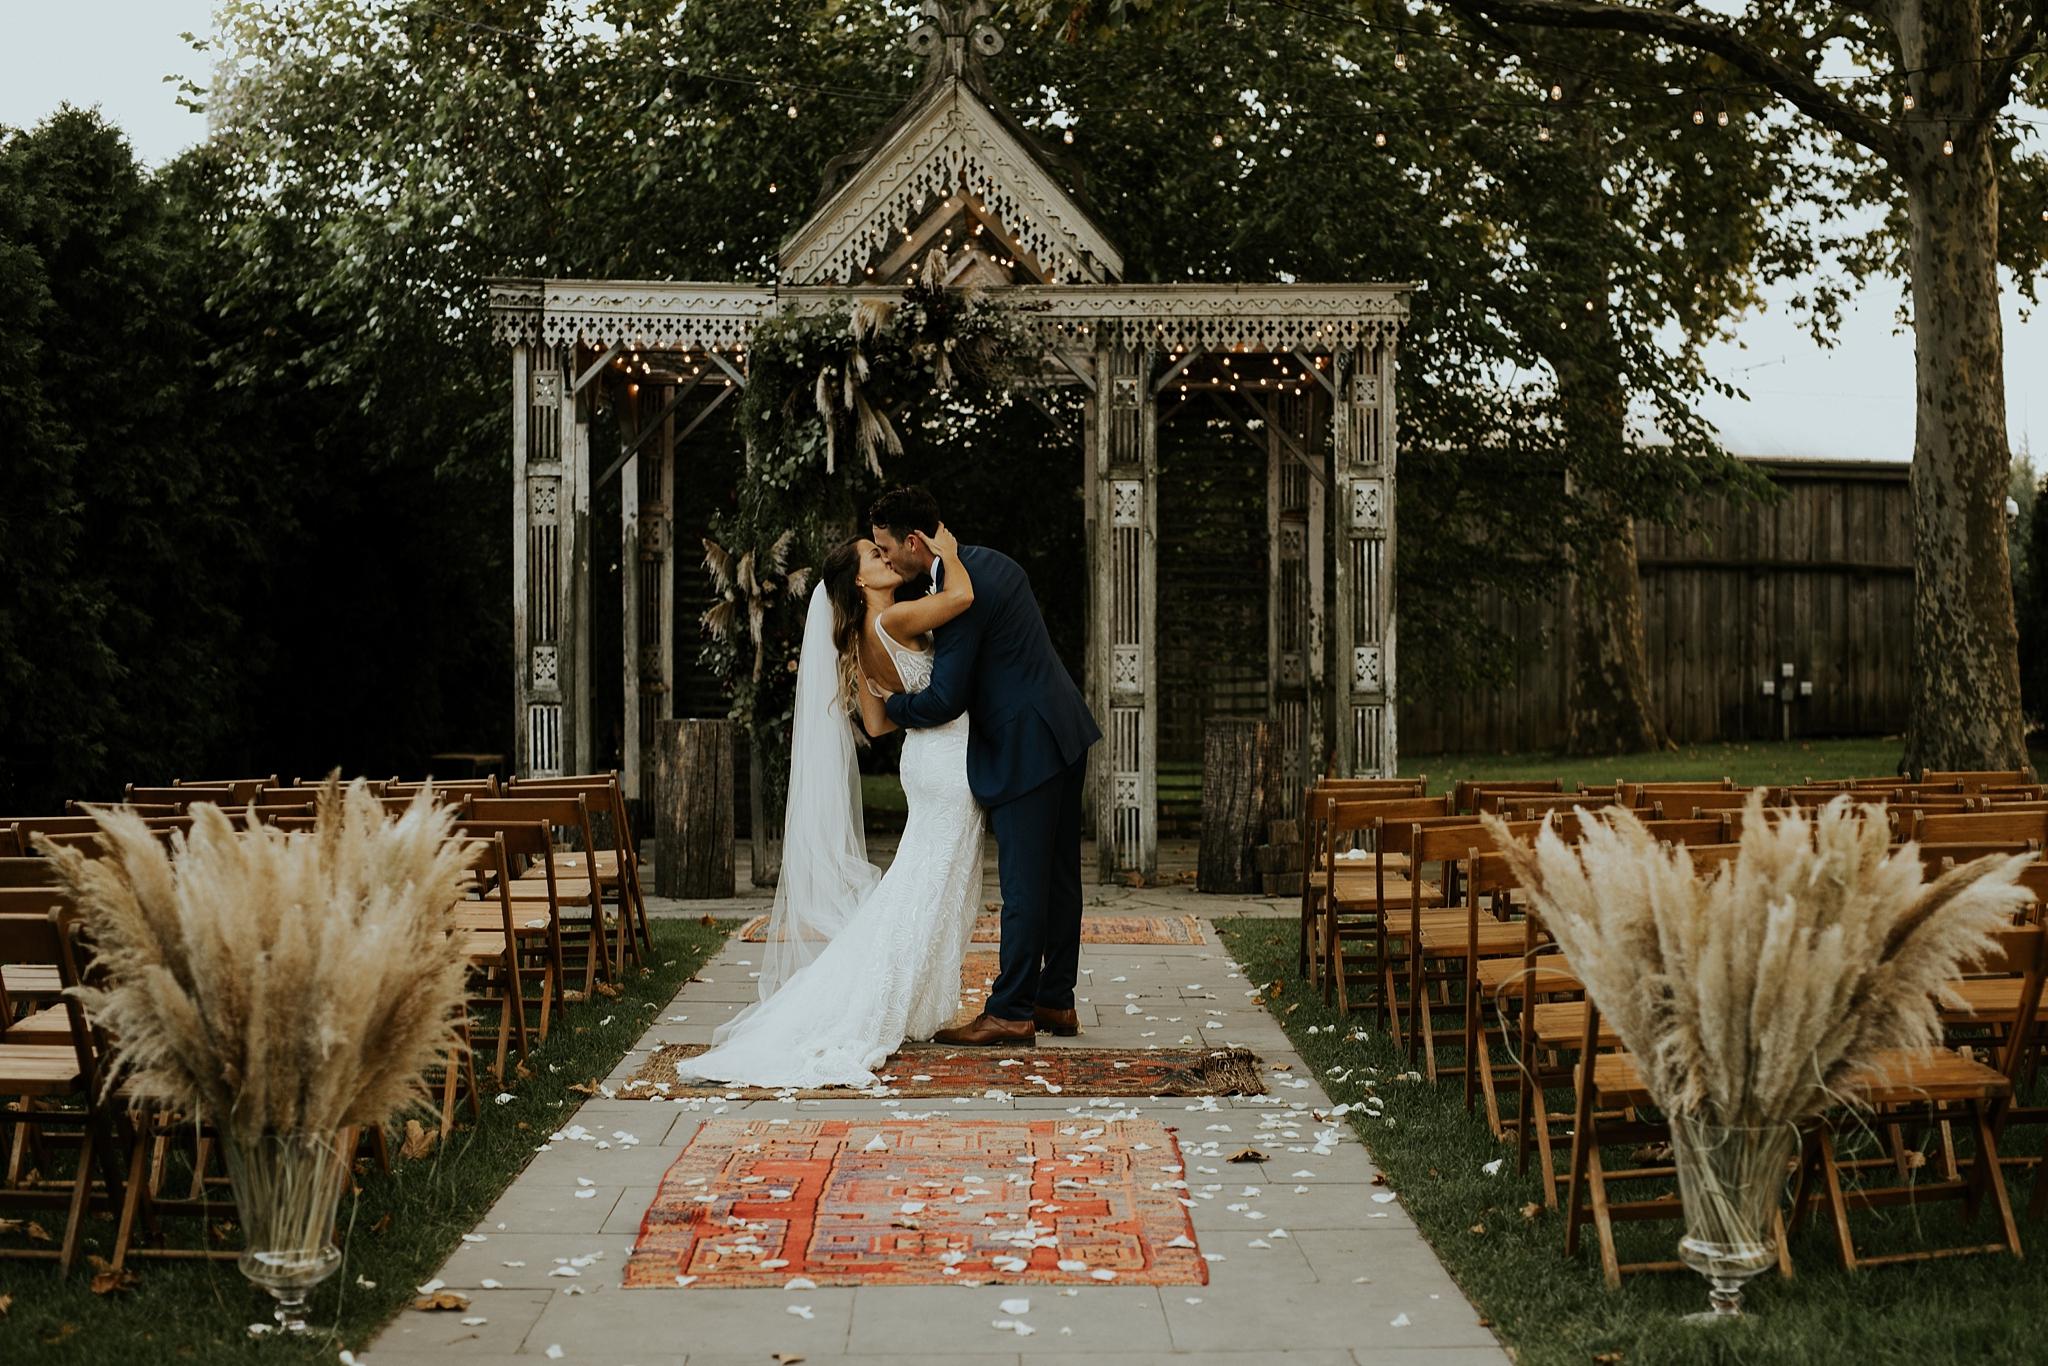 Heartfelt Botanical Terrain at Styers Wedding in Glenn Mills Pennslyvania by Trin Jensen Photography_0044.jpg